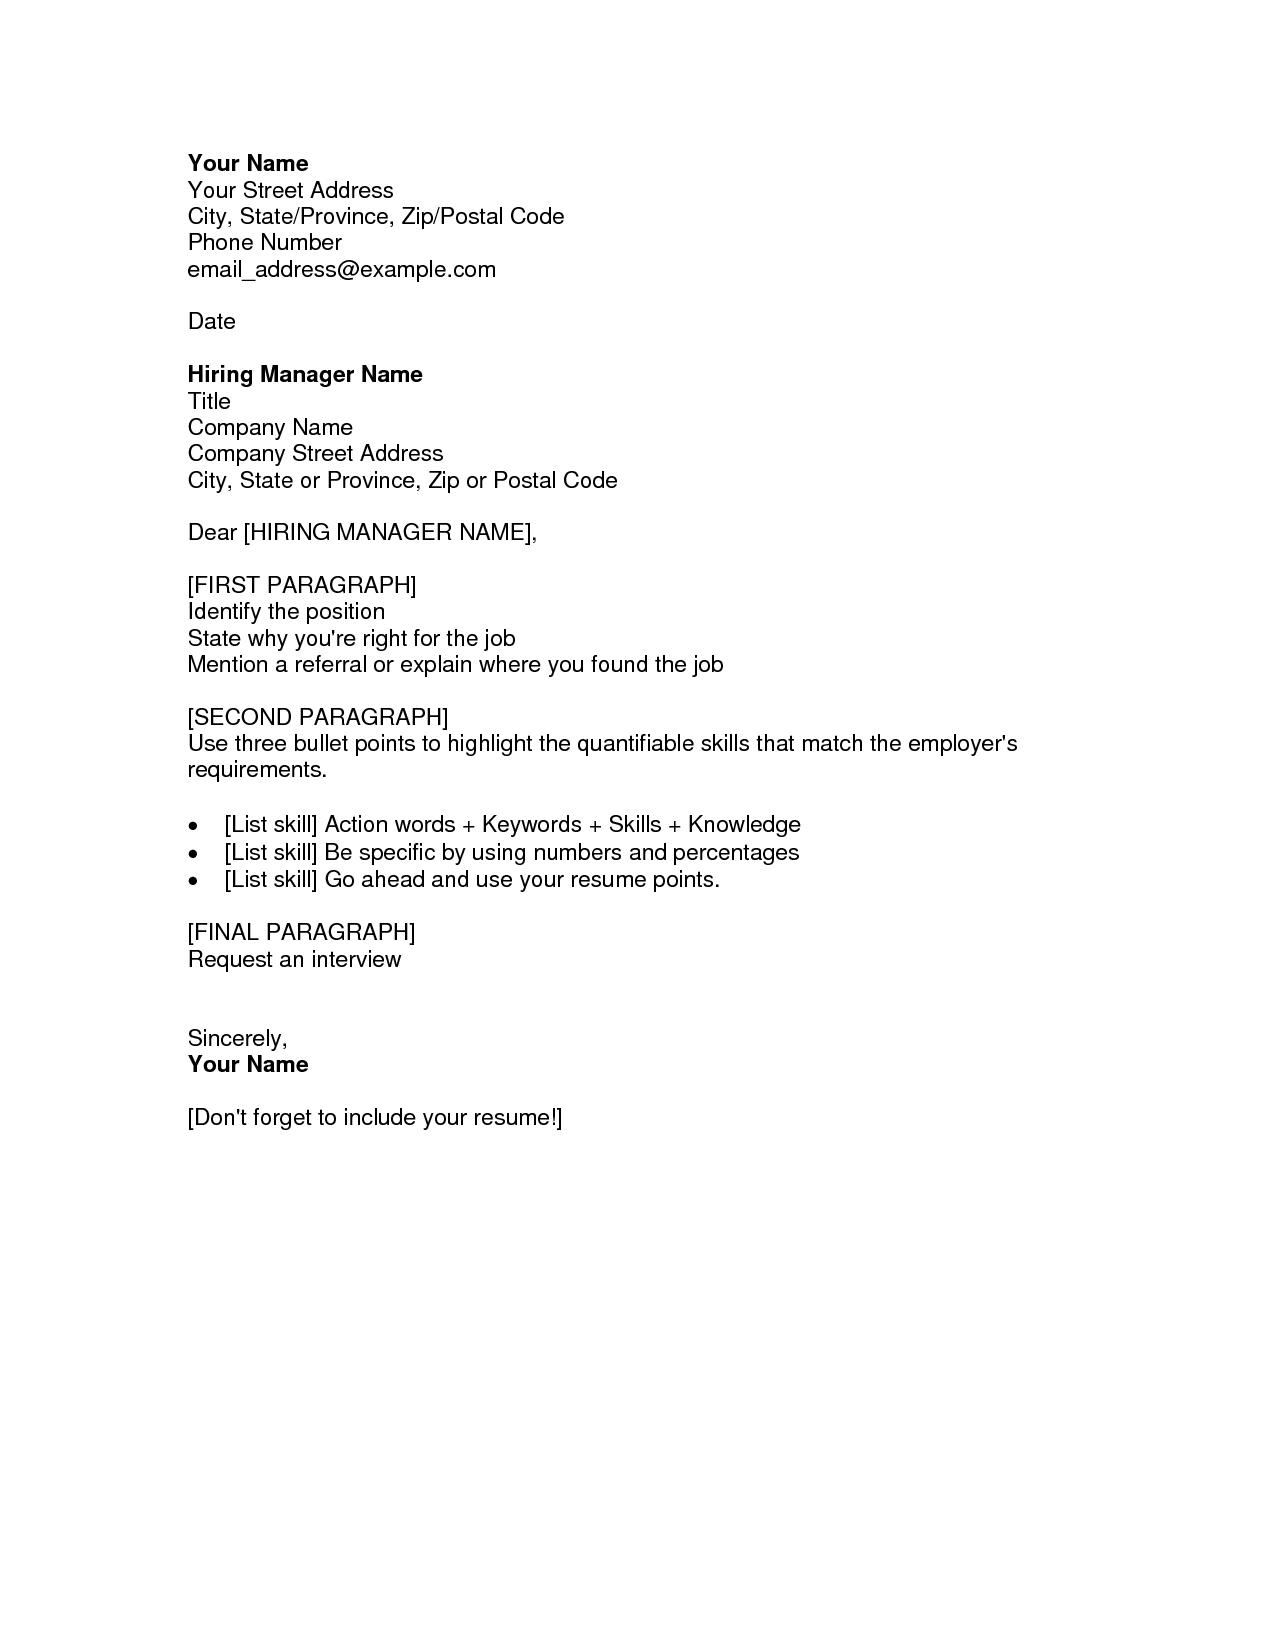 Resume Cover Letter Examples  Fotolip